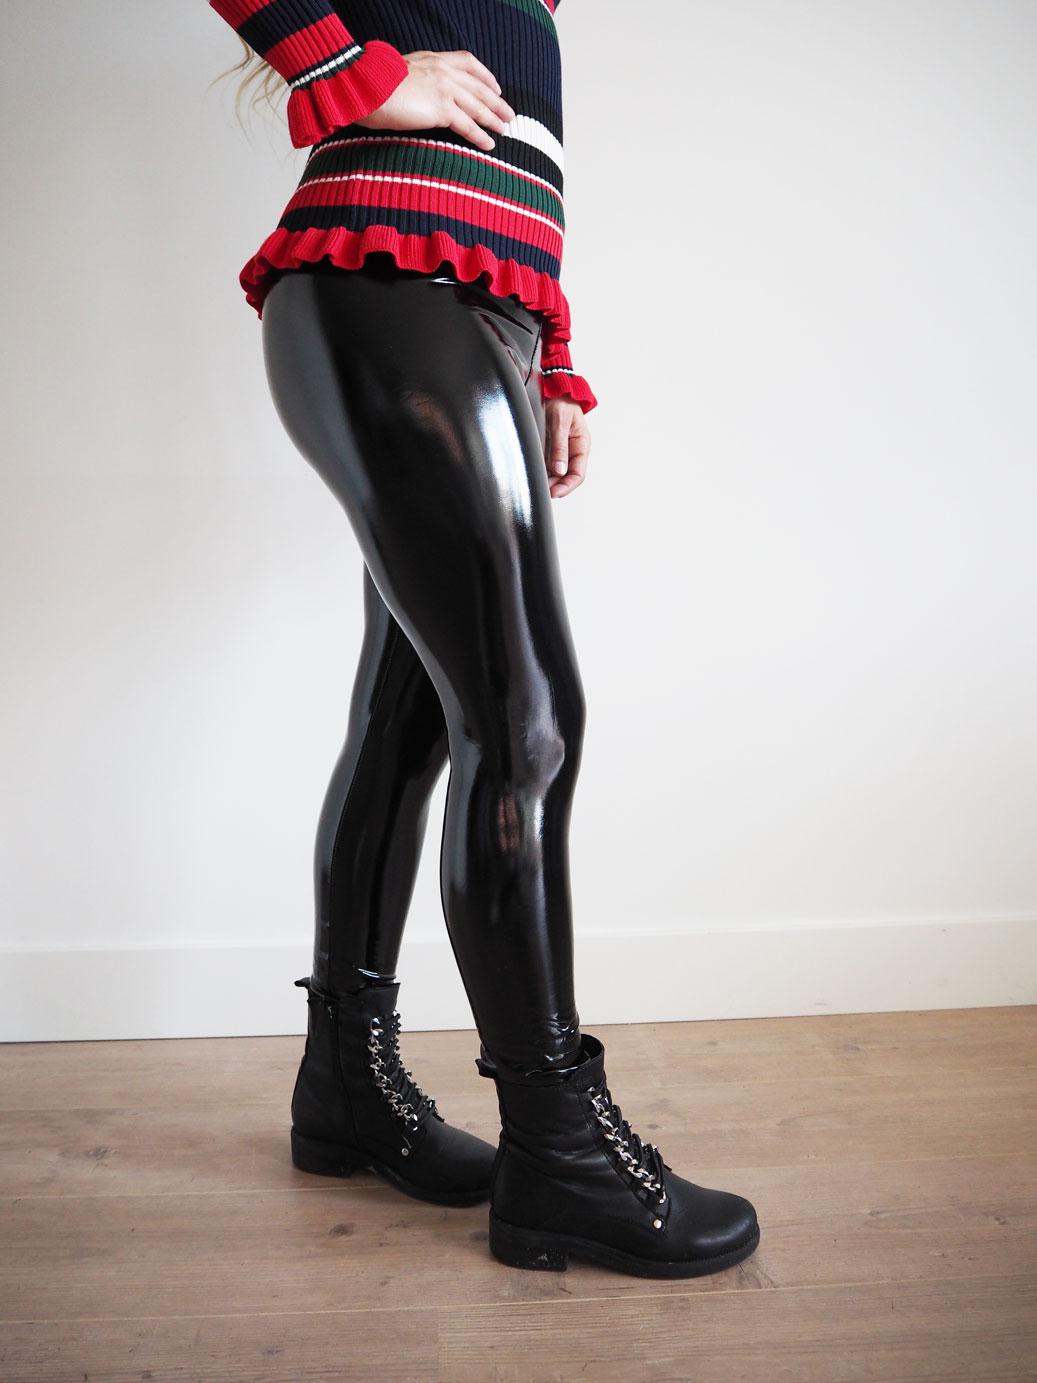 Spiksplinternieuw Lacquer Legging – Favourite Musthaves RG-79